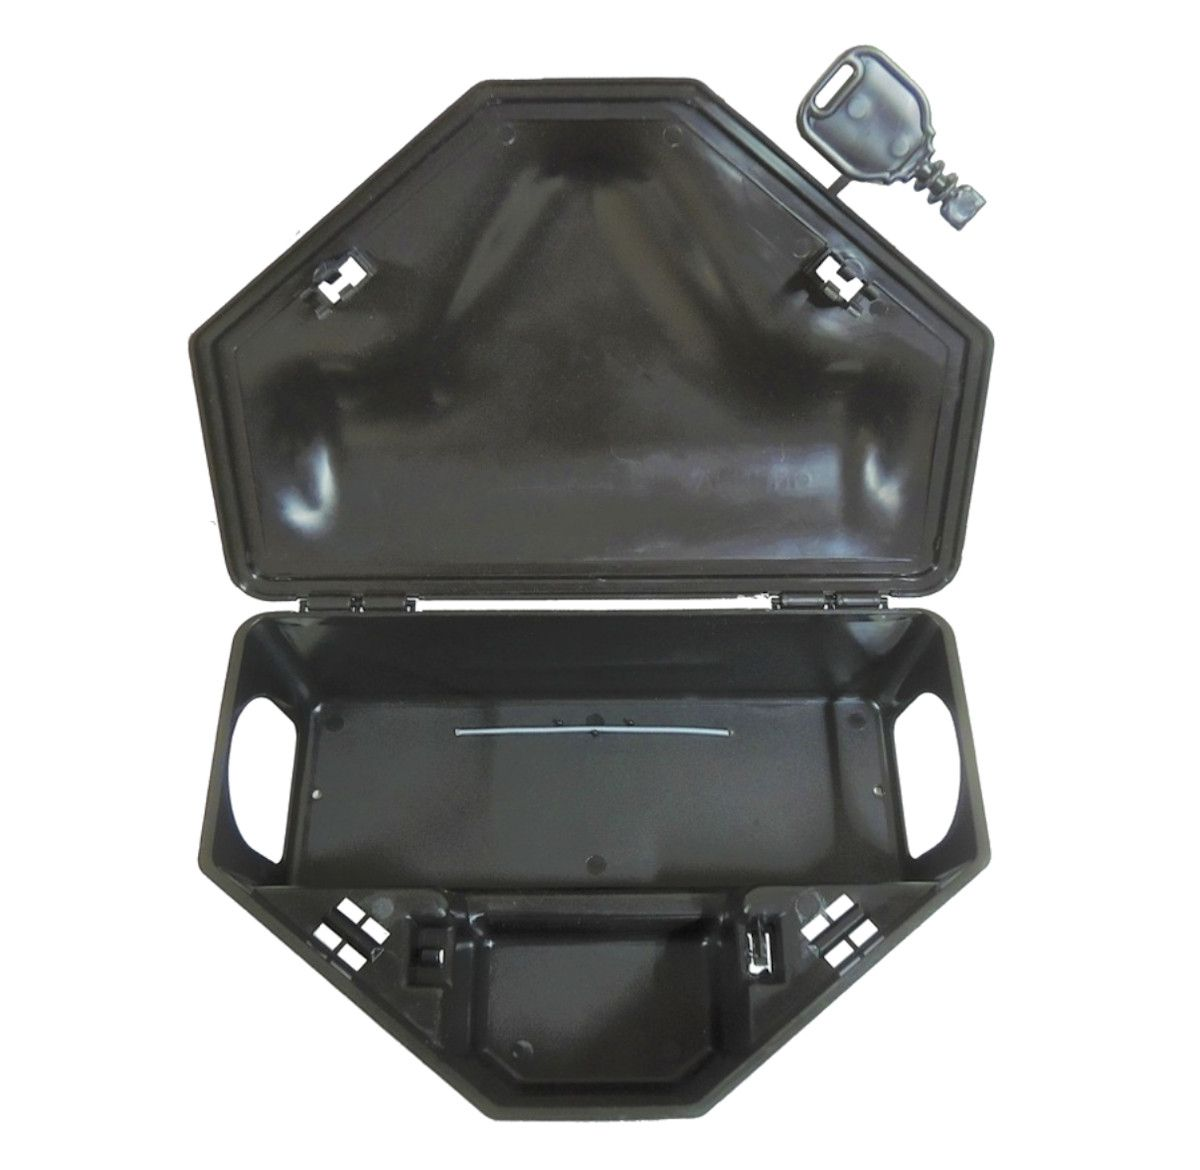 Kit 30 Porta Isca Com Chave Para Ratos